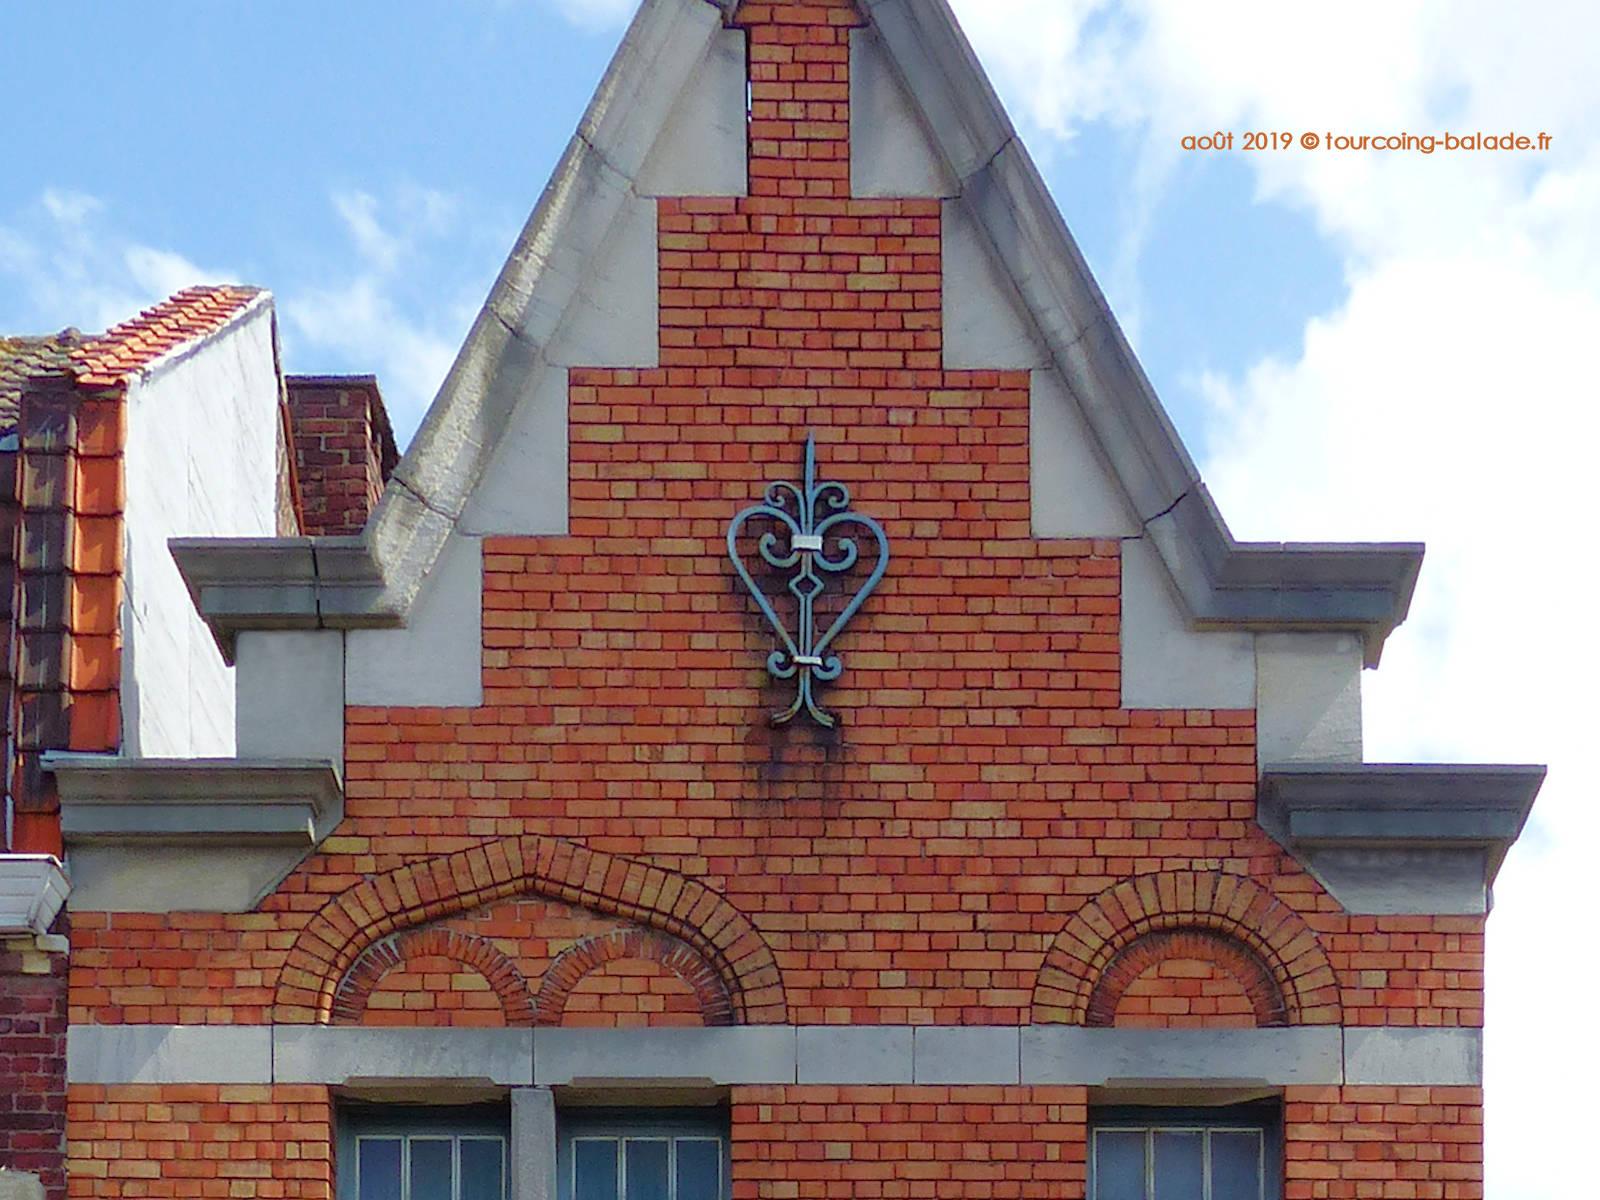 Fer d'ancrage façade Néo-Flamande, Tourcoing Blanc Seau, 2019